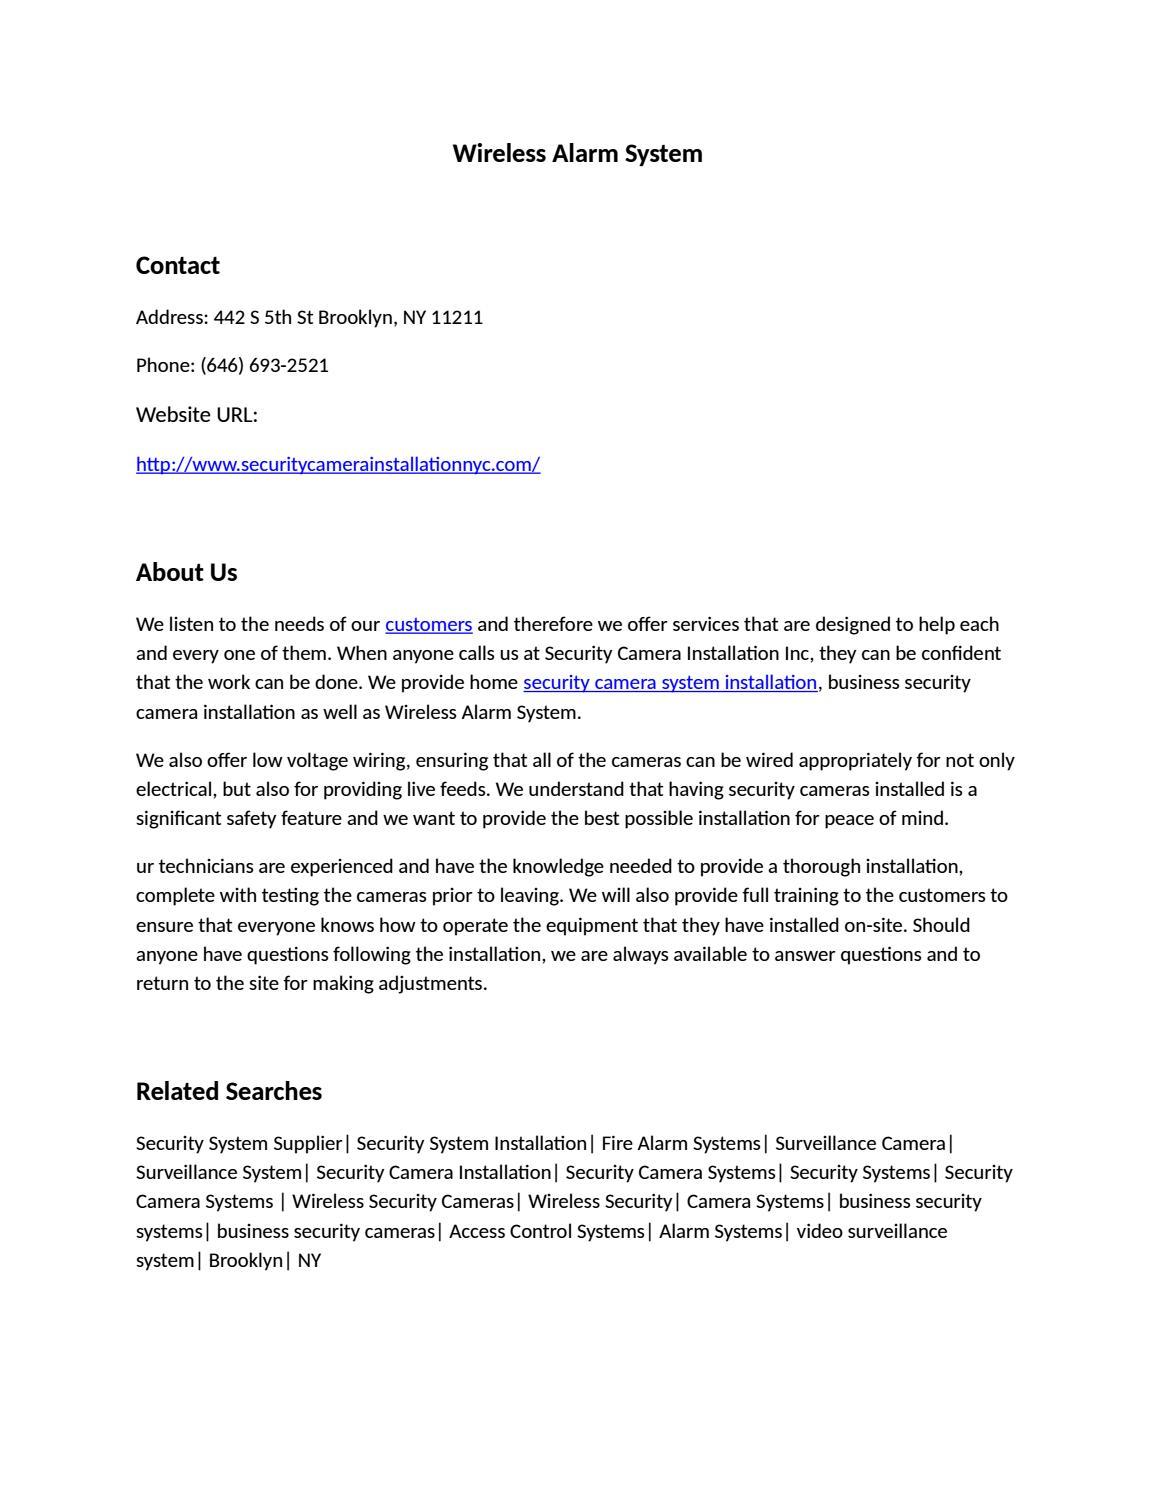 Wireless Alarm System by Wireless Alarm System - issuu